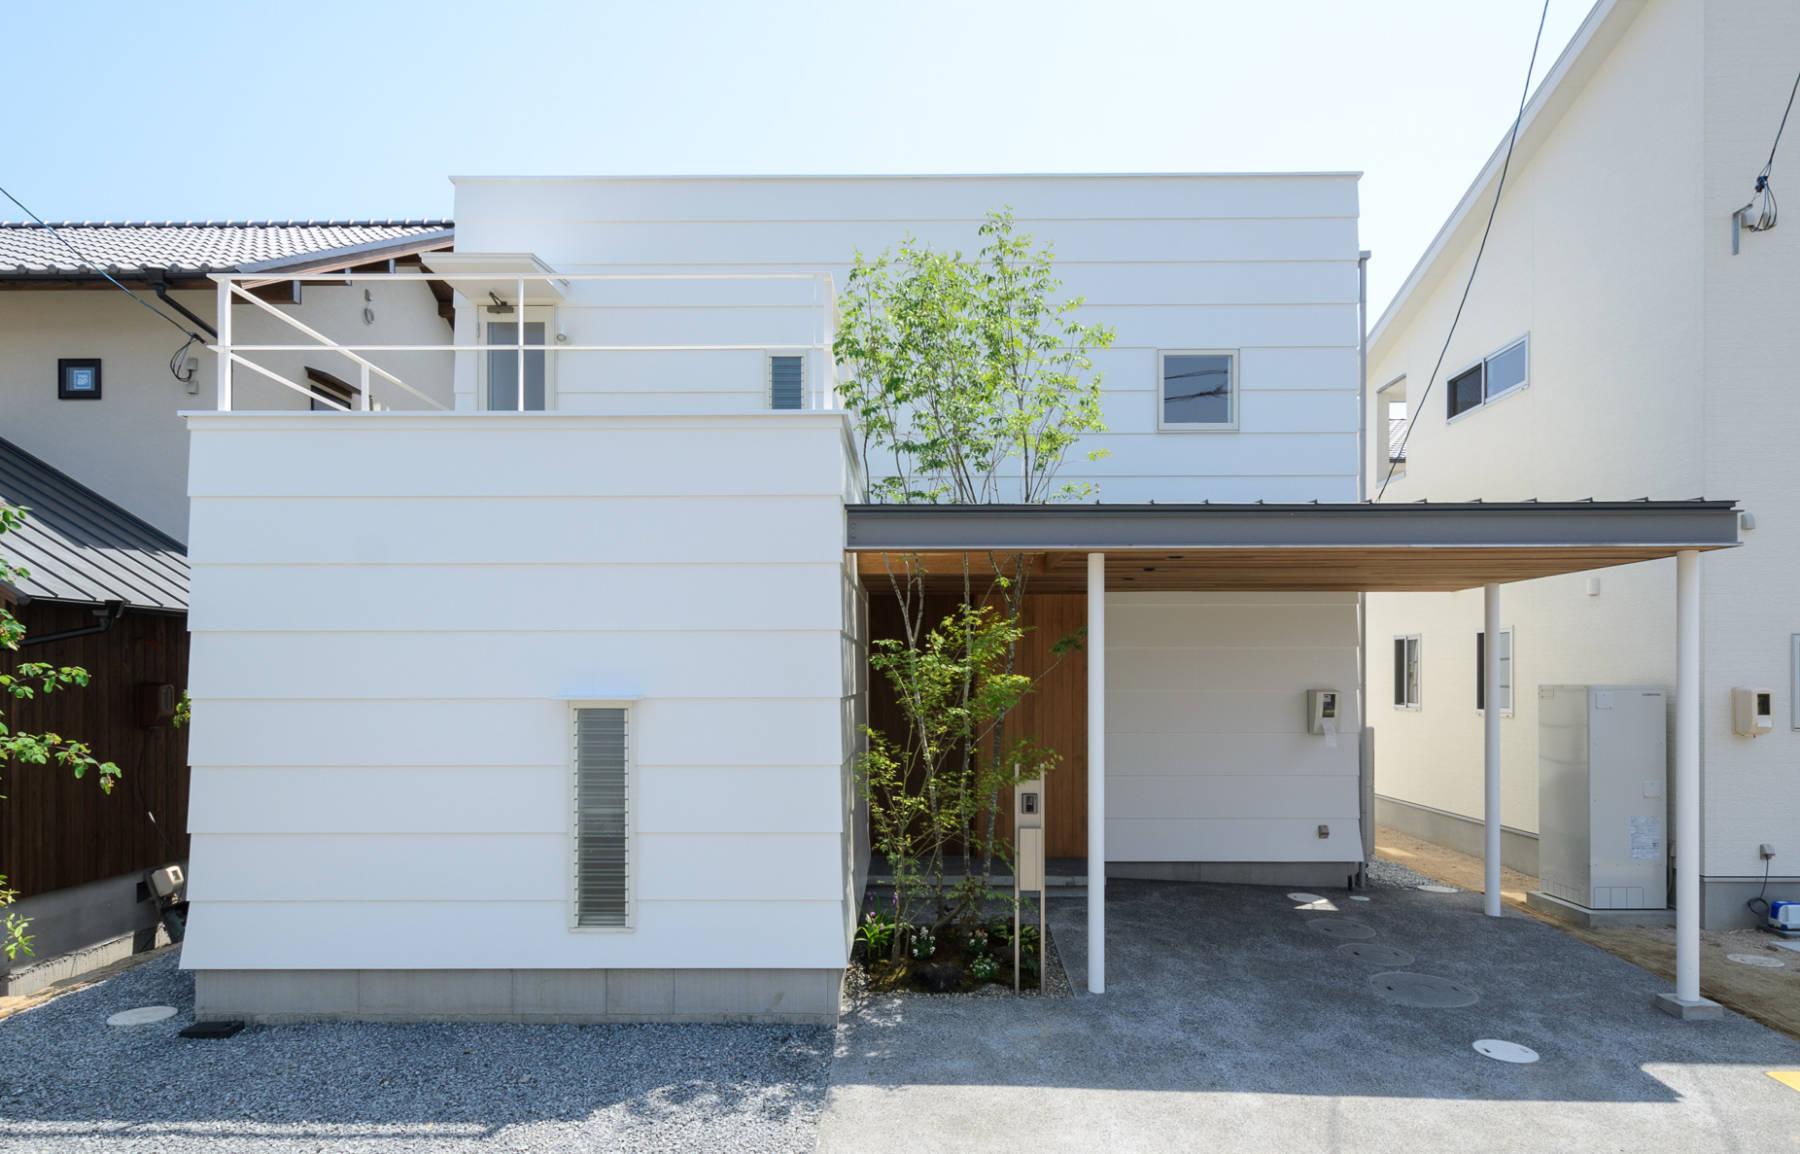 Okayama N.A_House ガレージのあるコンパクトな家